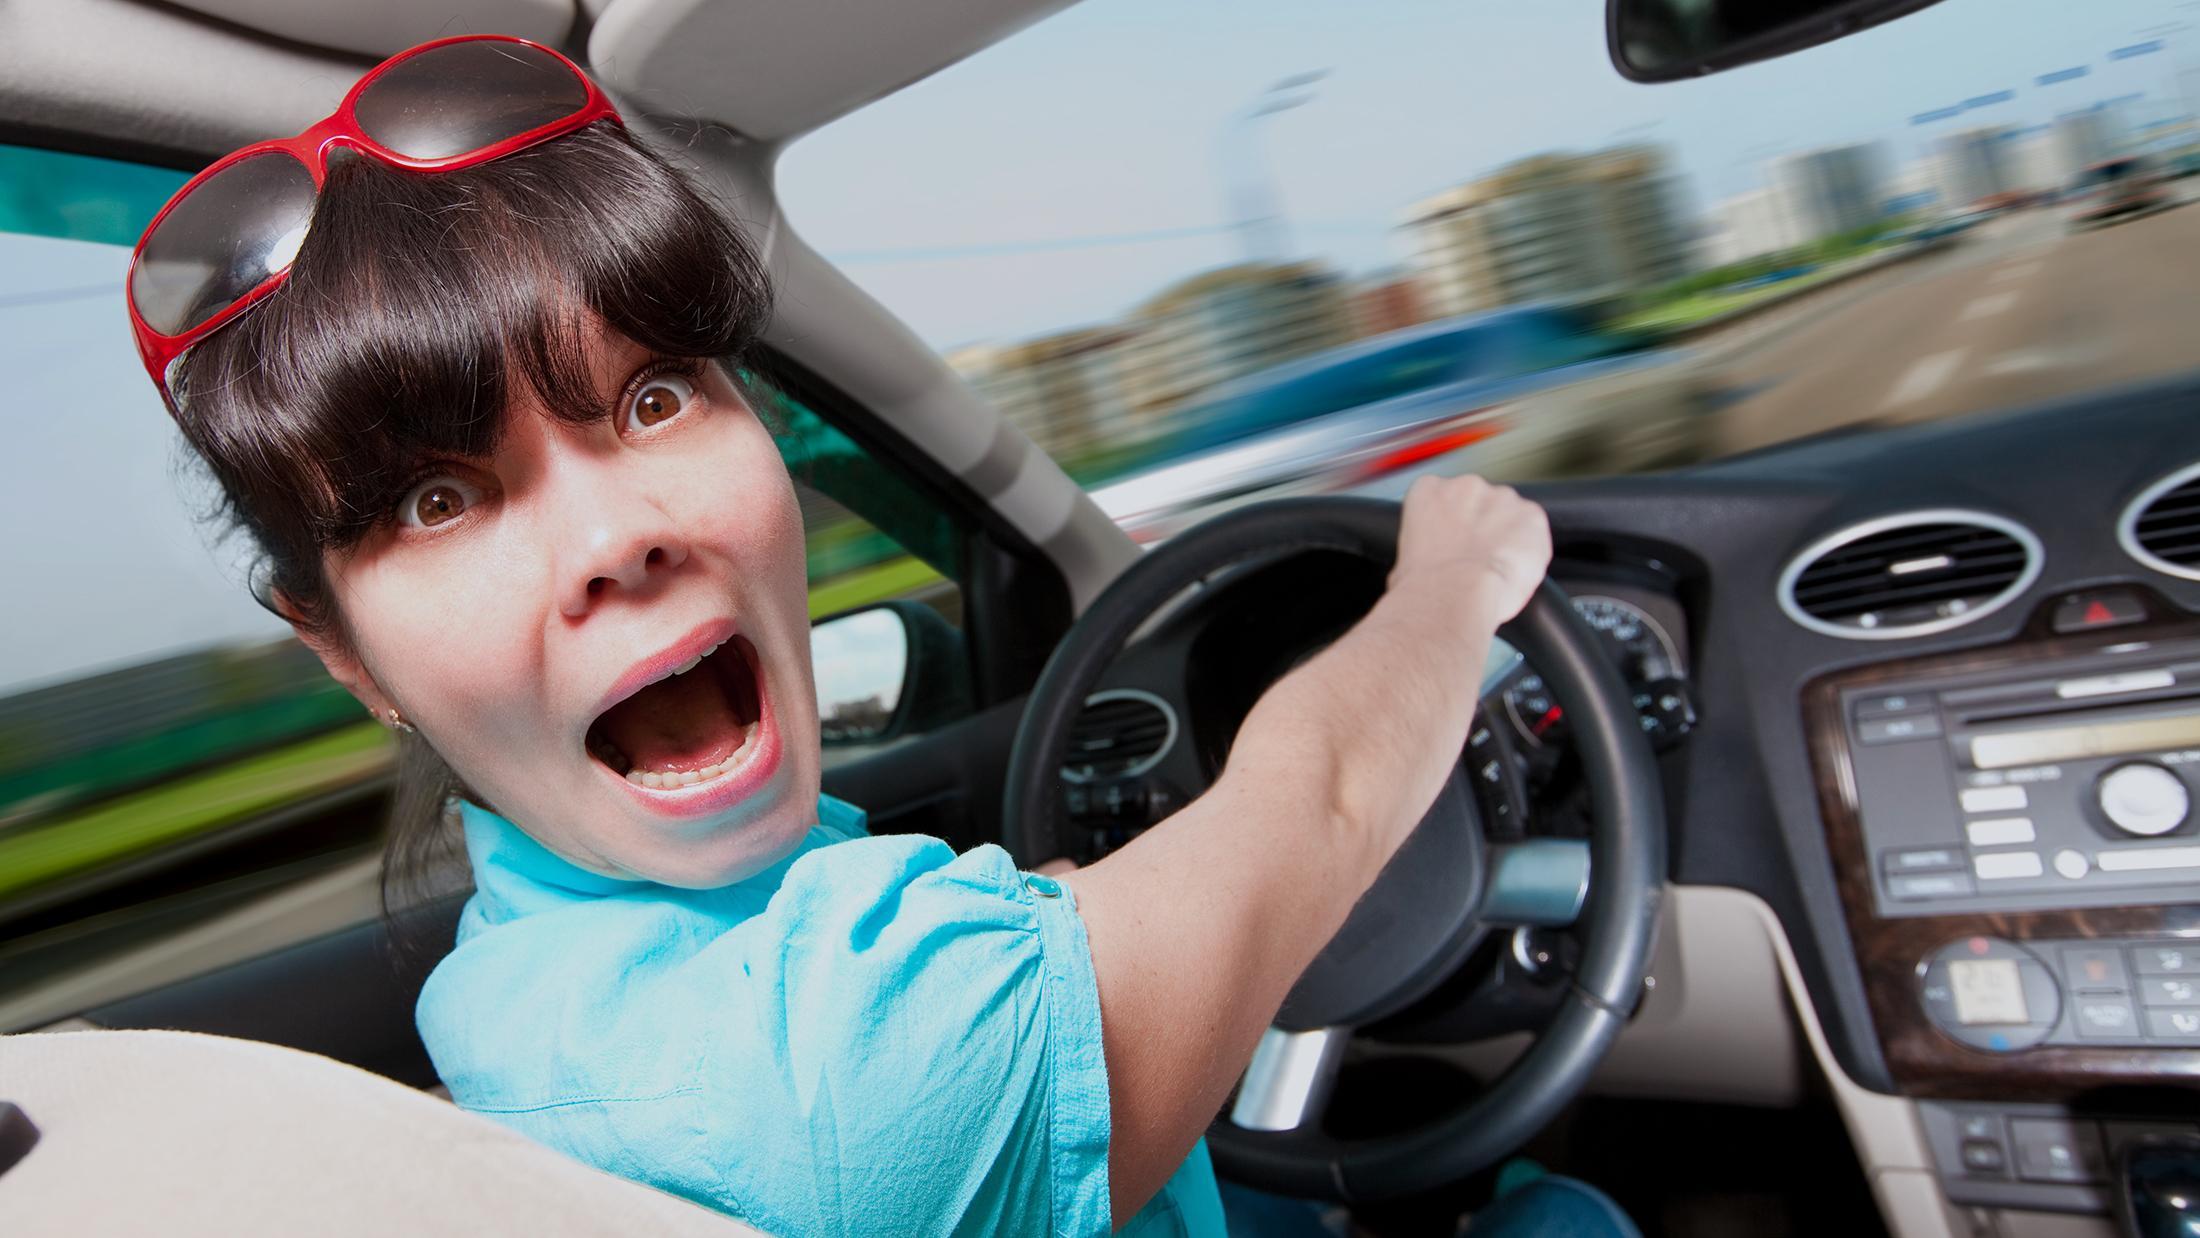 "<p>Фото © <a href=""https://ru.depositphotos.com/3441238/stock-photo-women-driving-a-car.html"" target=""_blank"" rel=""noopener noreferrer"">Depositphotos</a></p>"